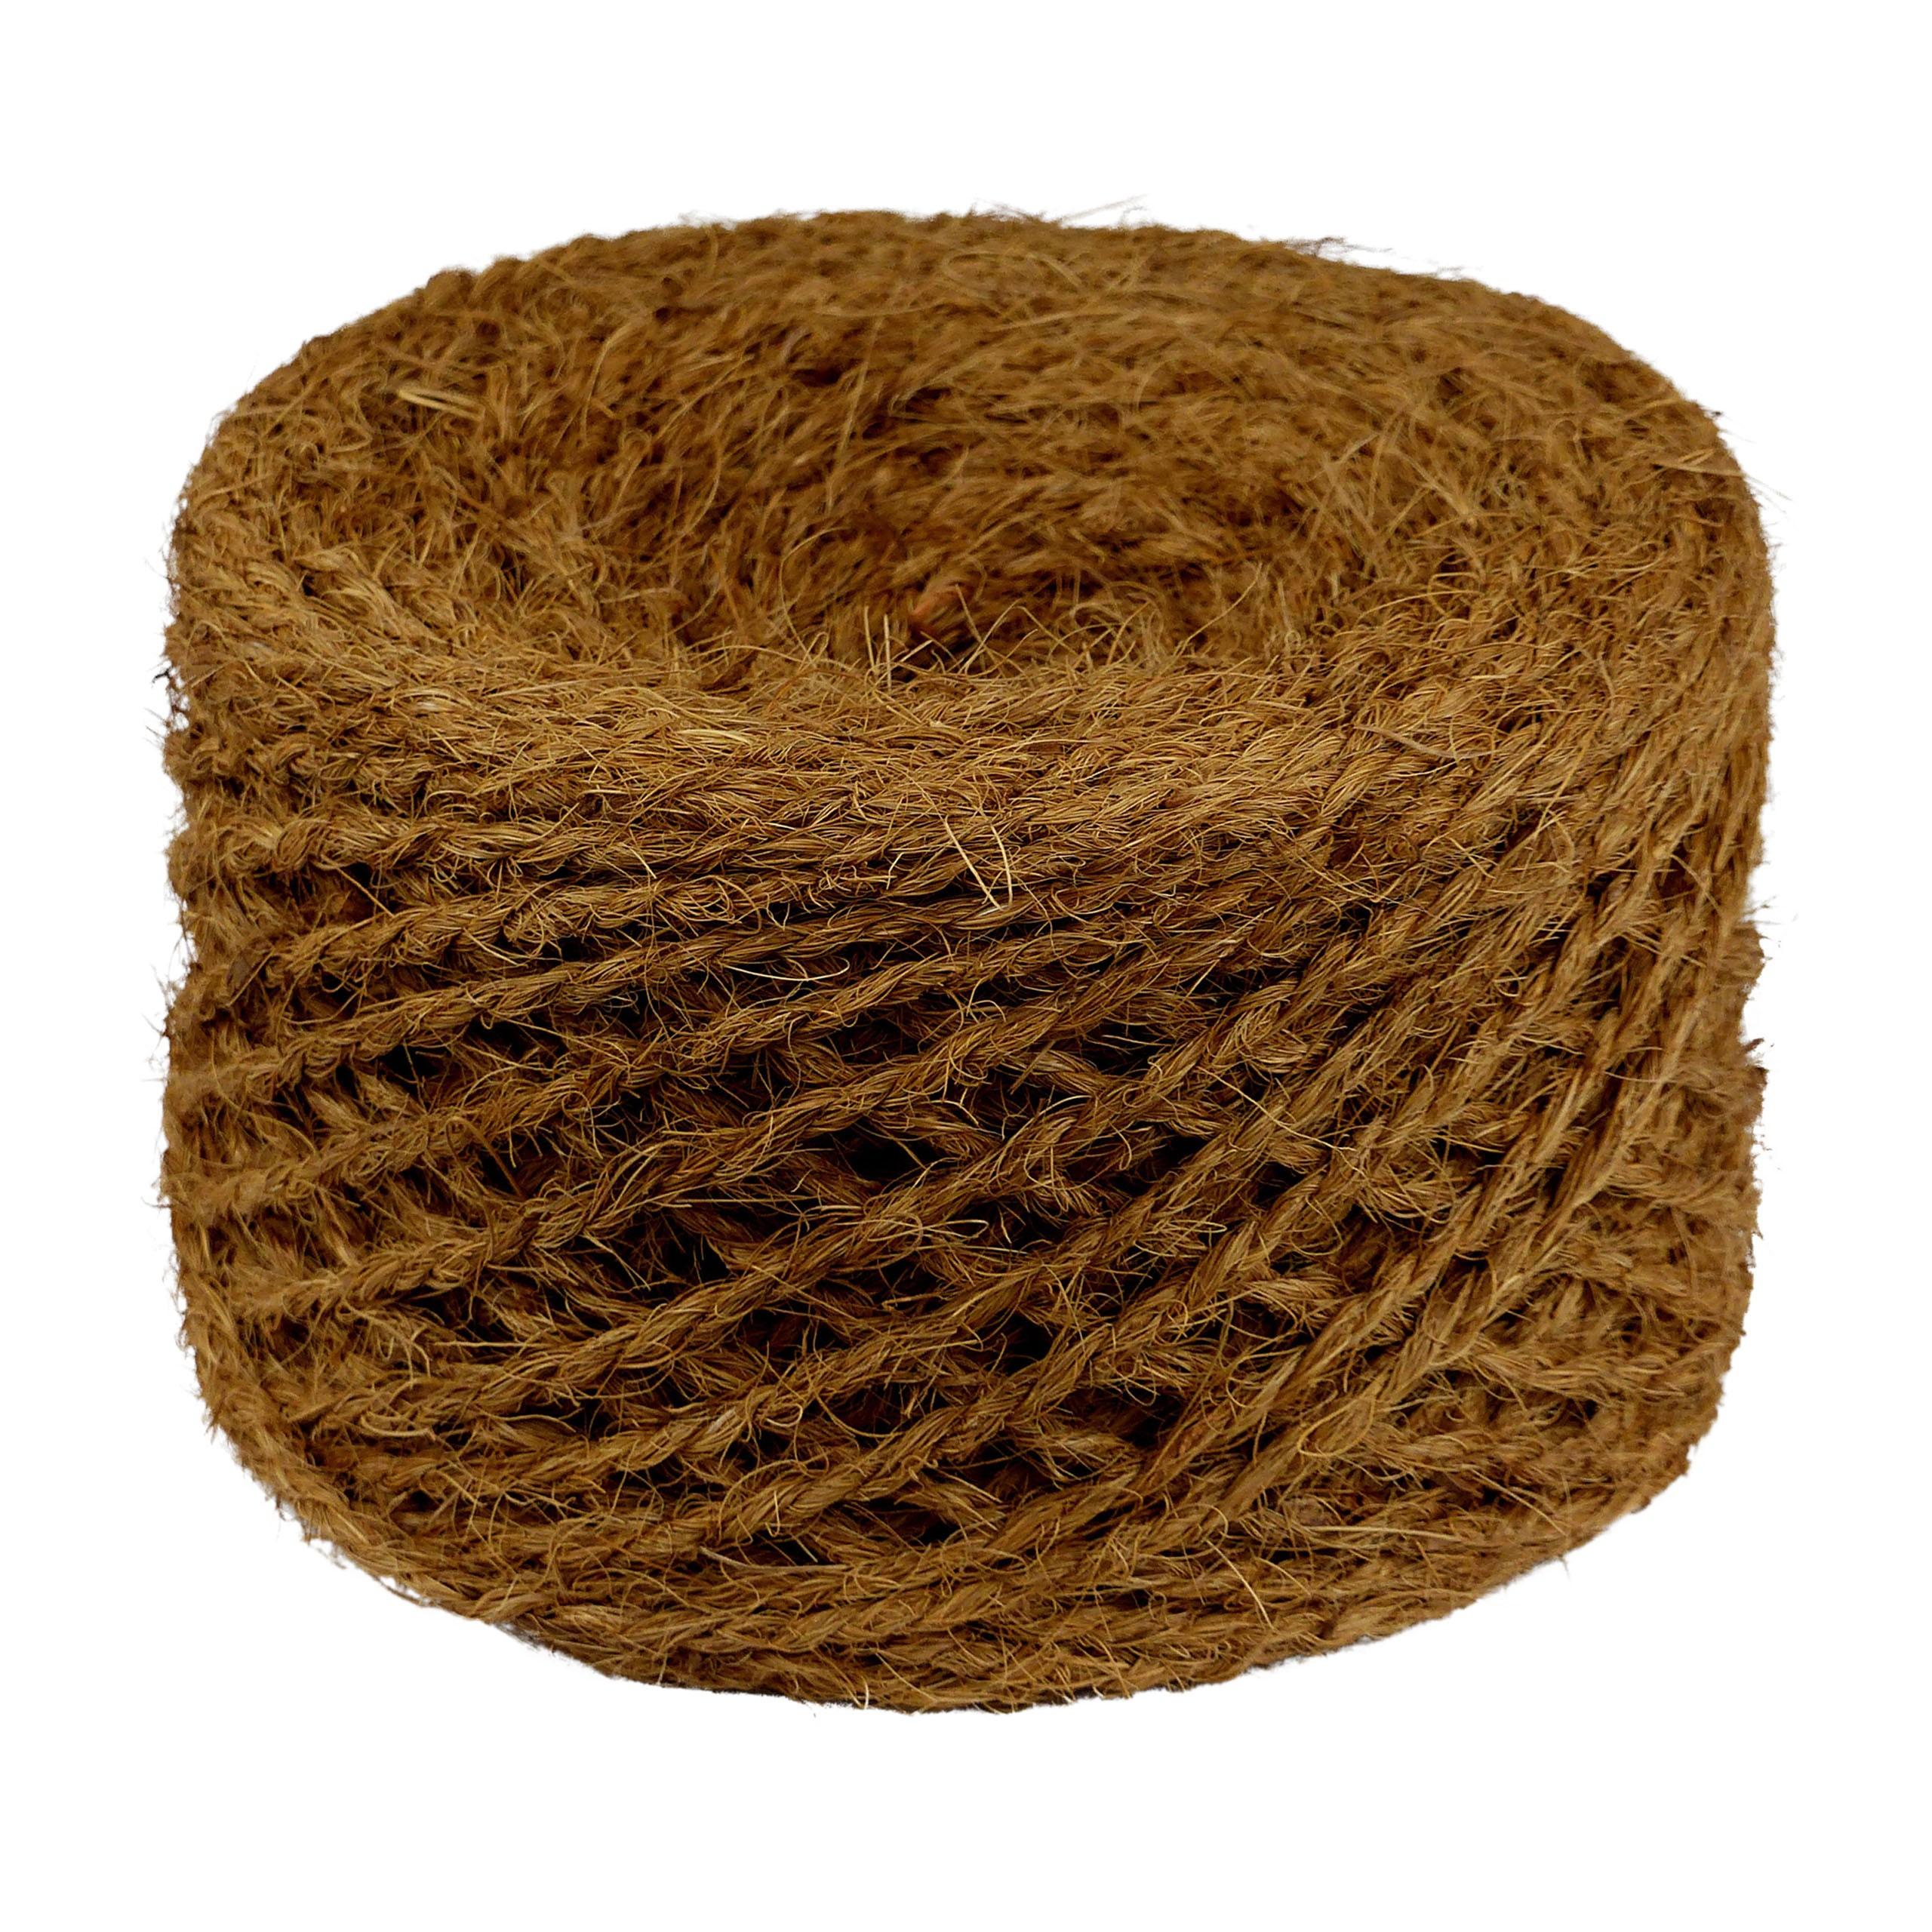 Kokosseil - Baumbindeband - Naturseil - Länge 100 m - Stärke ca. 3,5 mm - 1